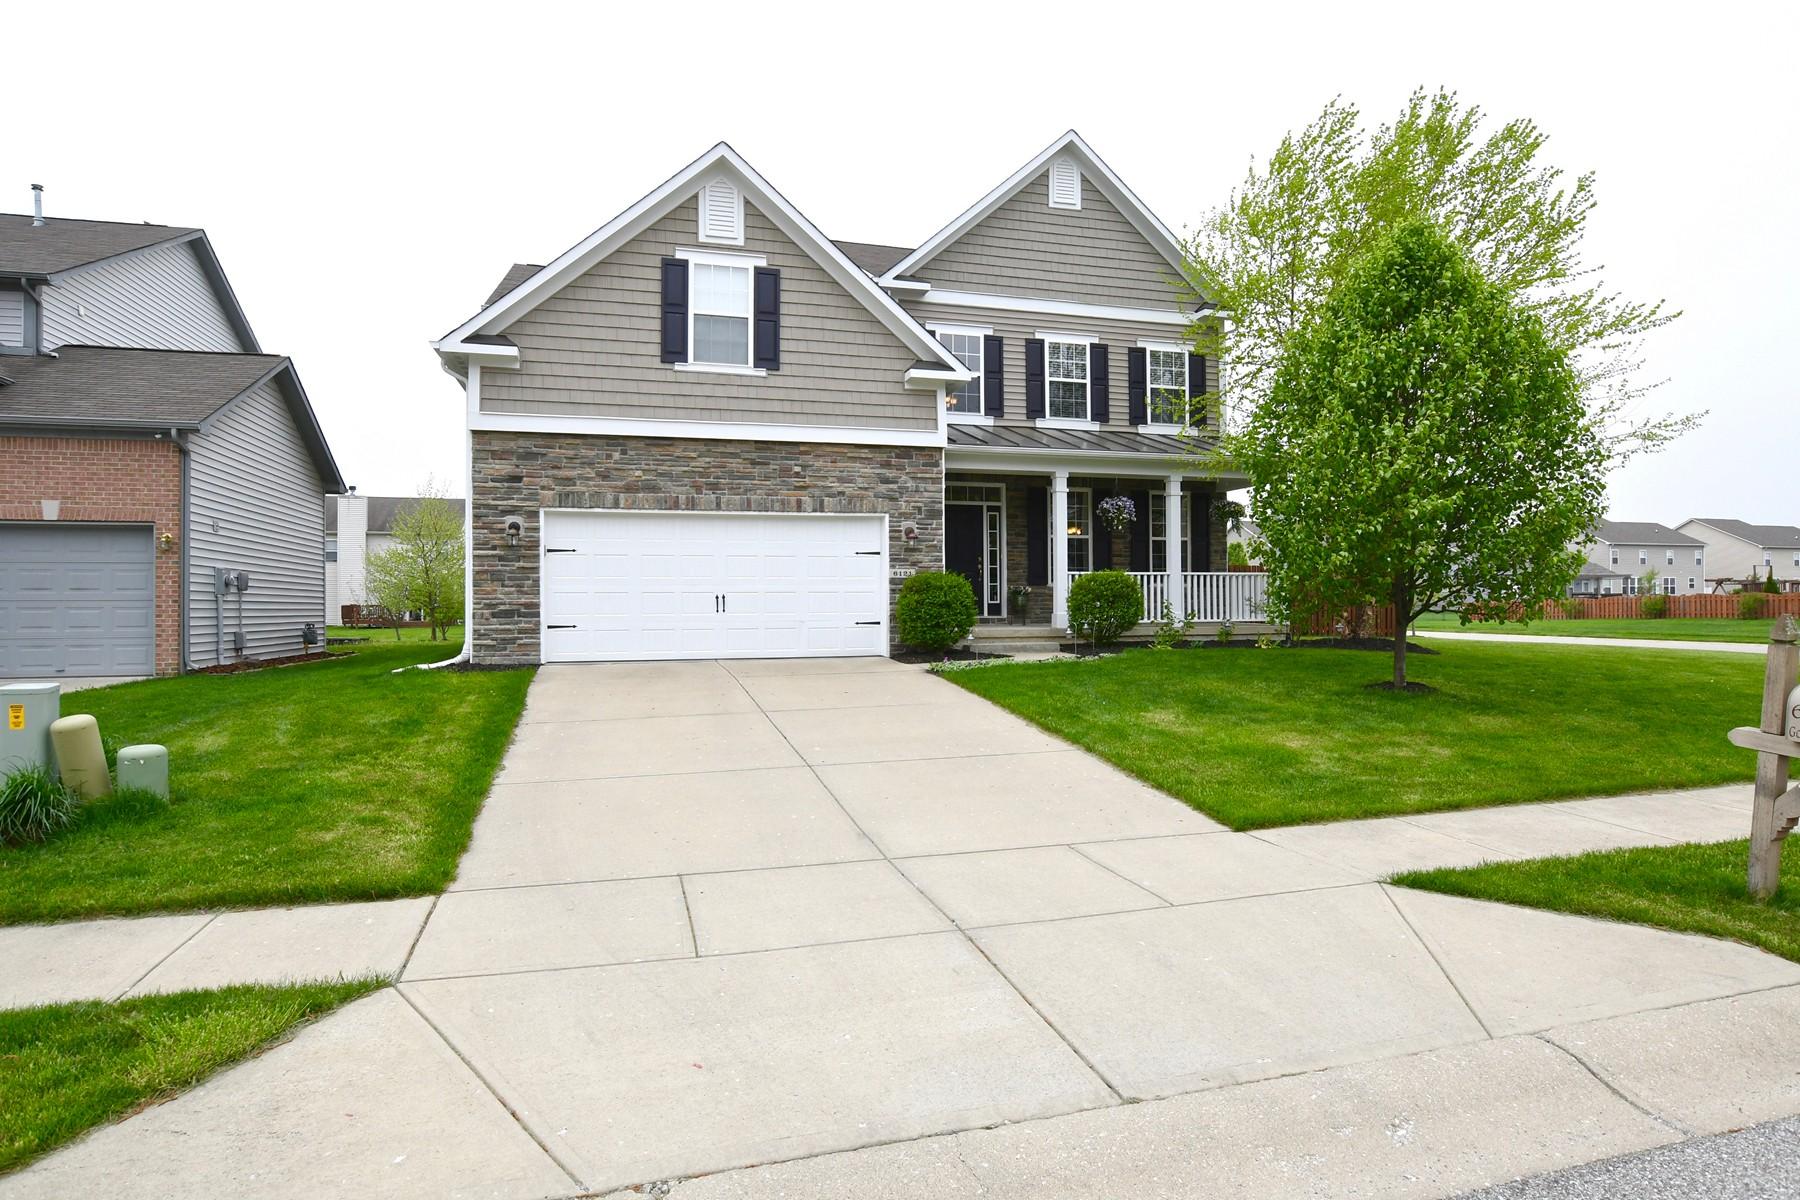 獨棟家庭住宅 為 出售 在 First Rate Home 6121 Golden Eagle Dr Zionsville, 印第安那州, 46077 美國